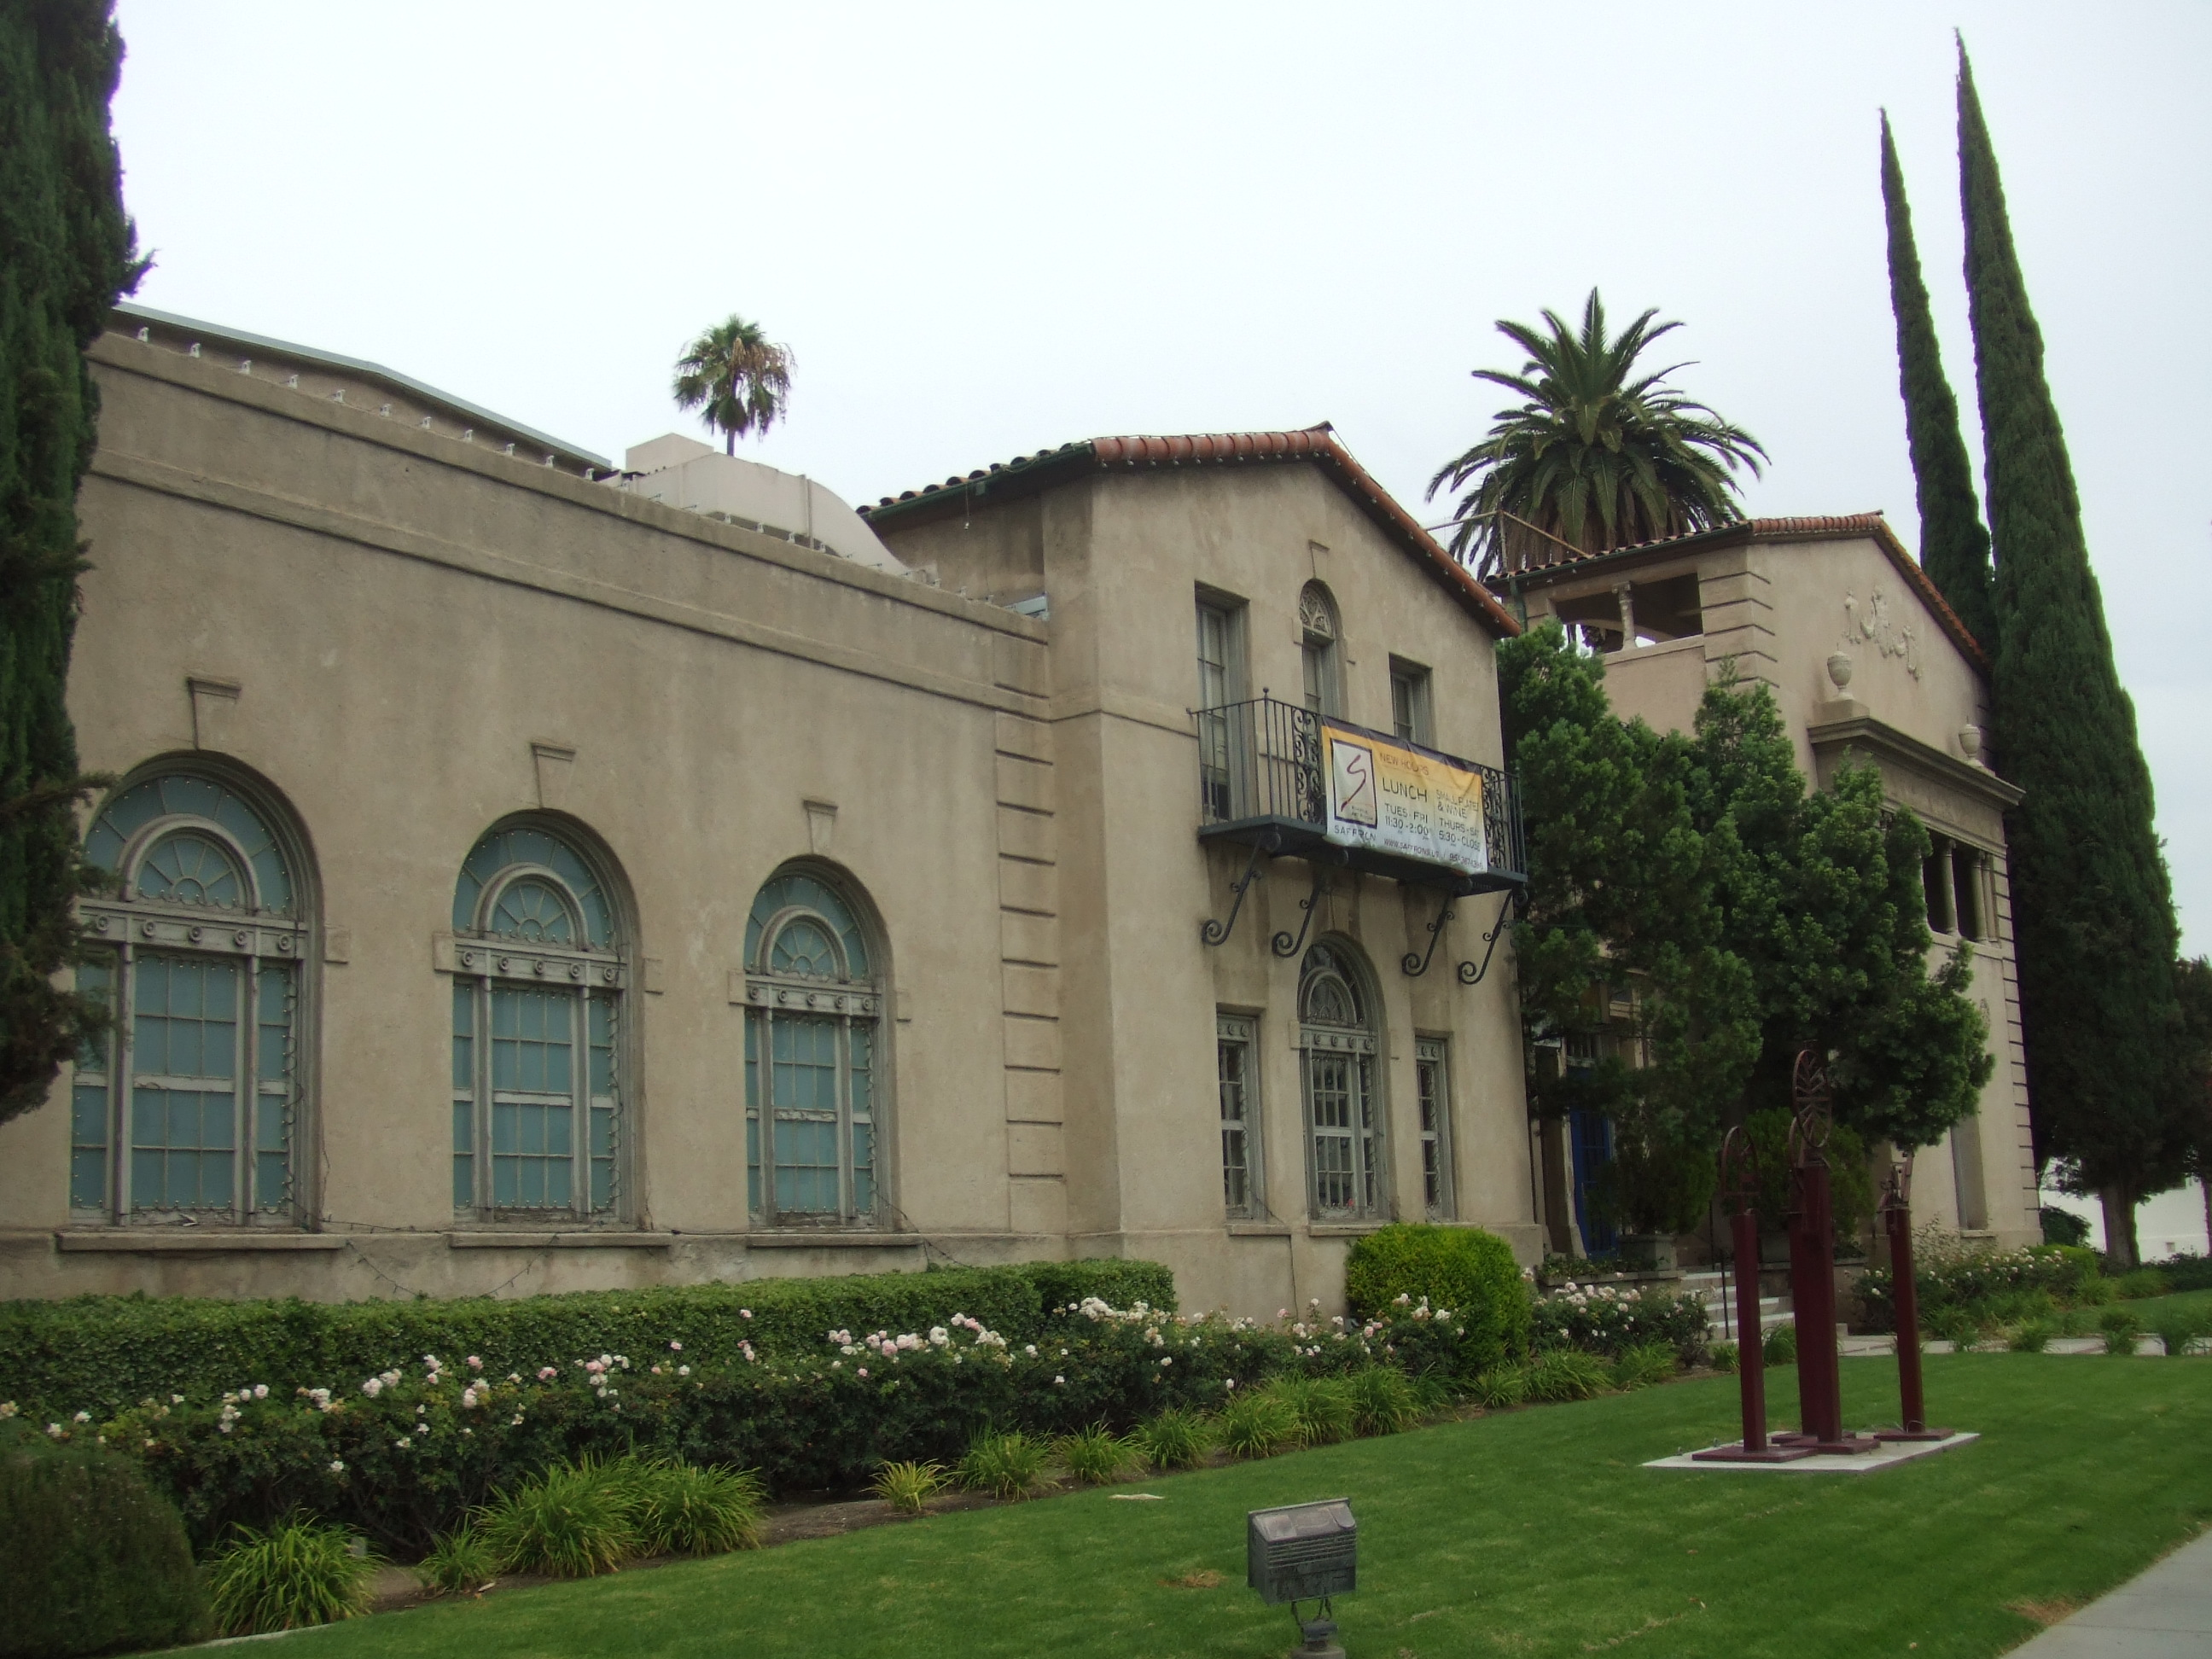 The Riverside Art Museum